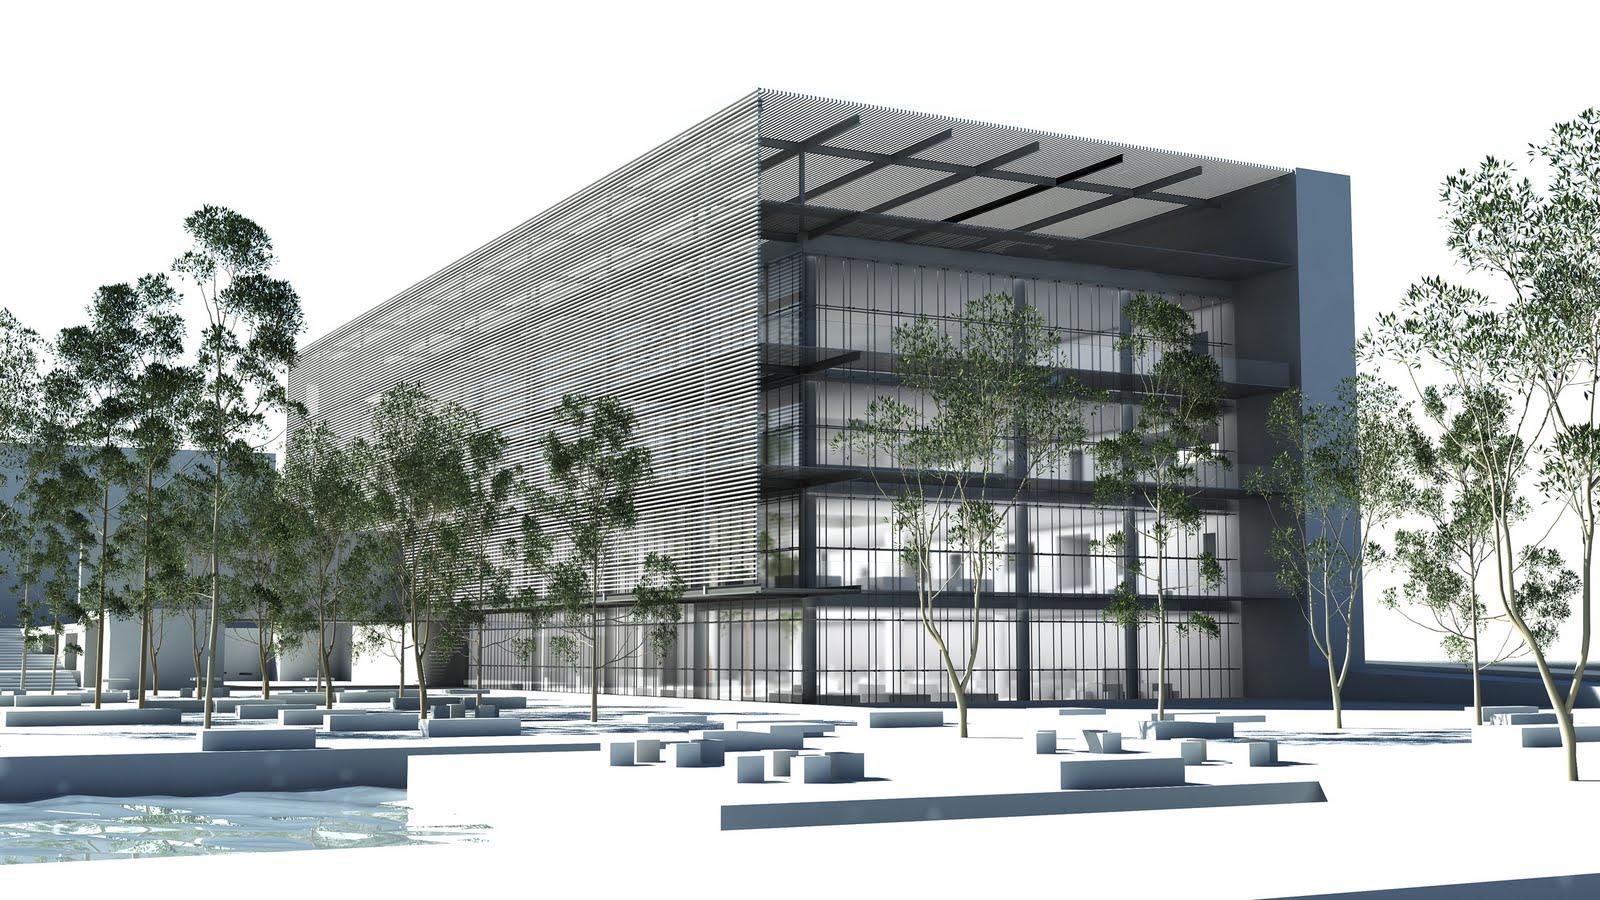 Alerta arquitectura biblioteca en manzanares marcelo for Infografia arquitectura